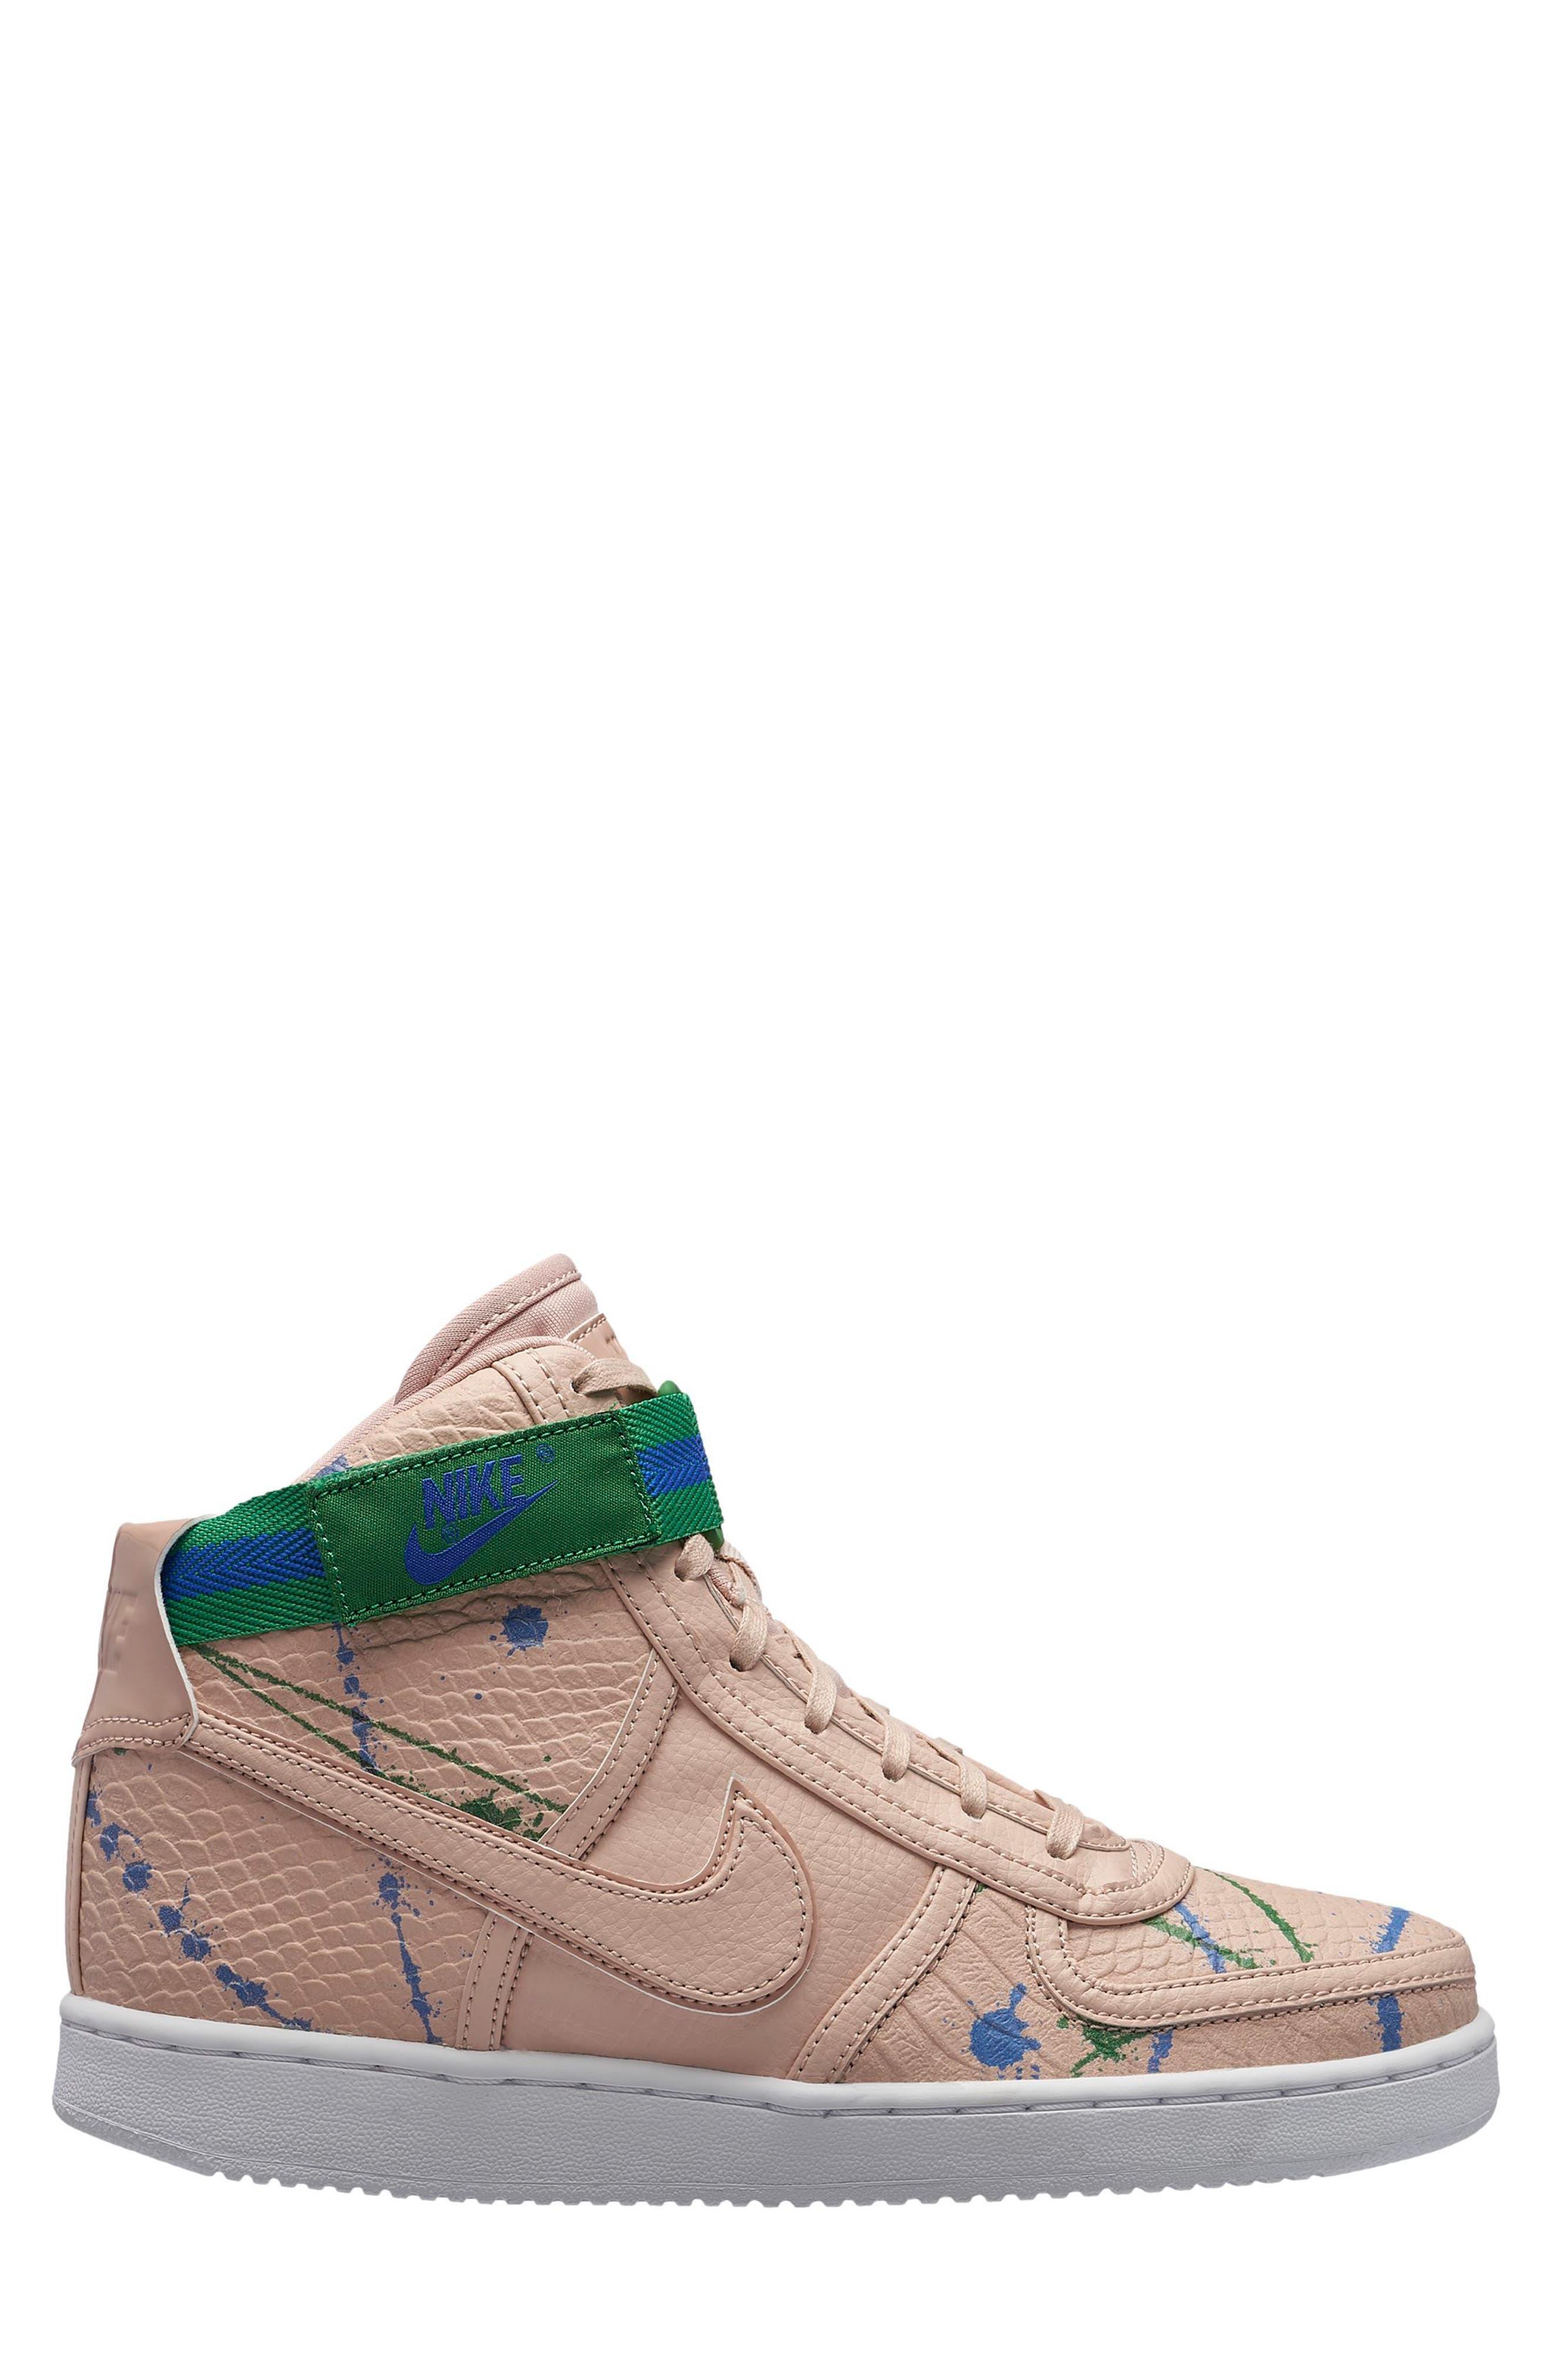 Nike Vandal High Lux Sneaker (Women)